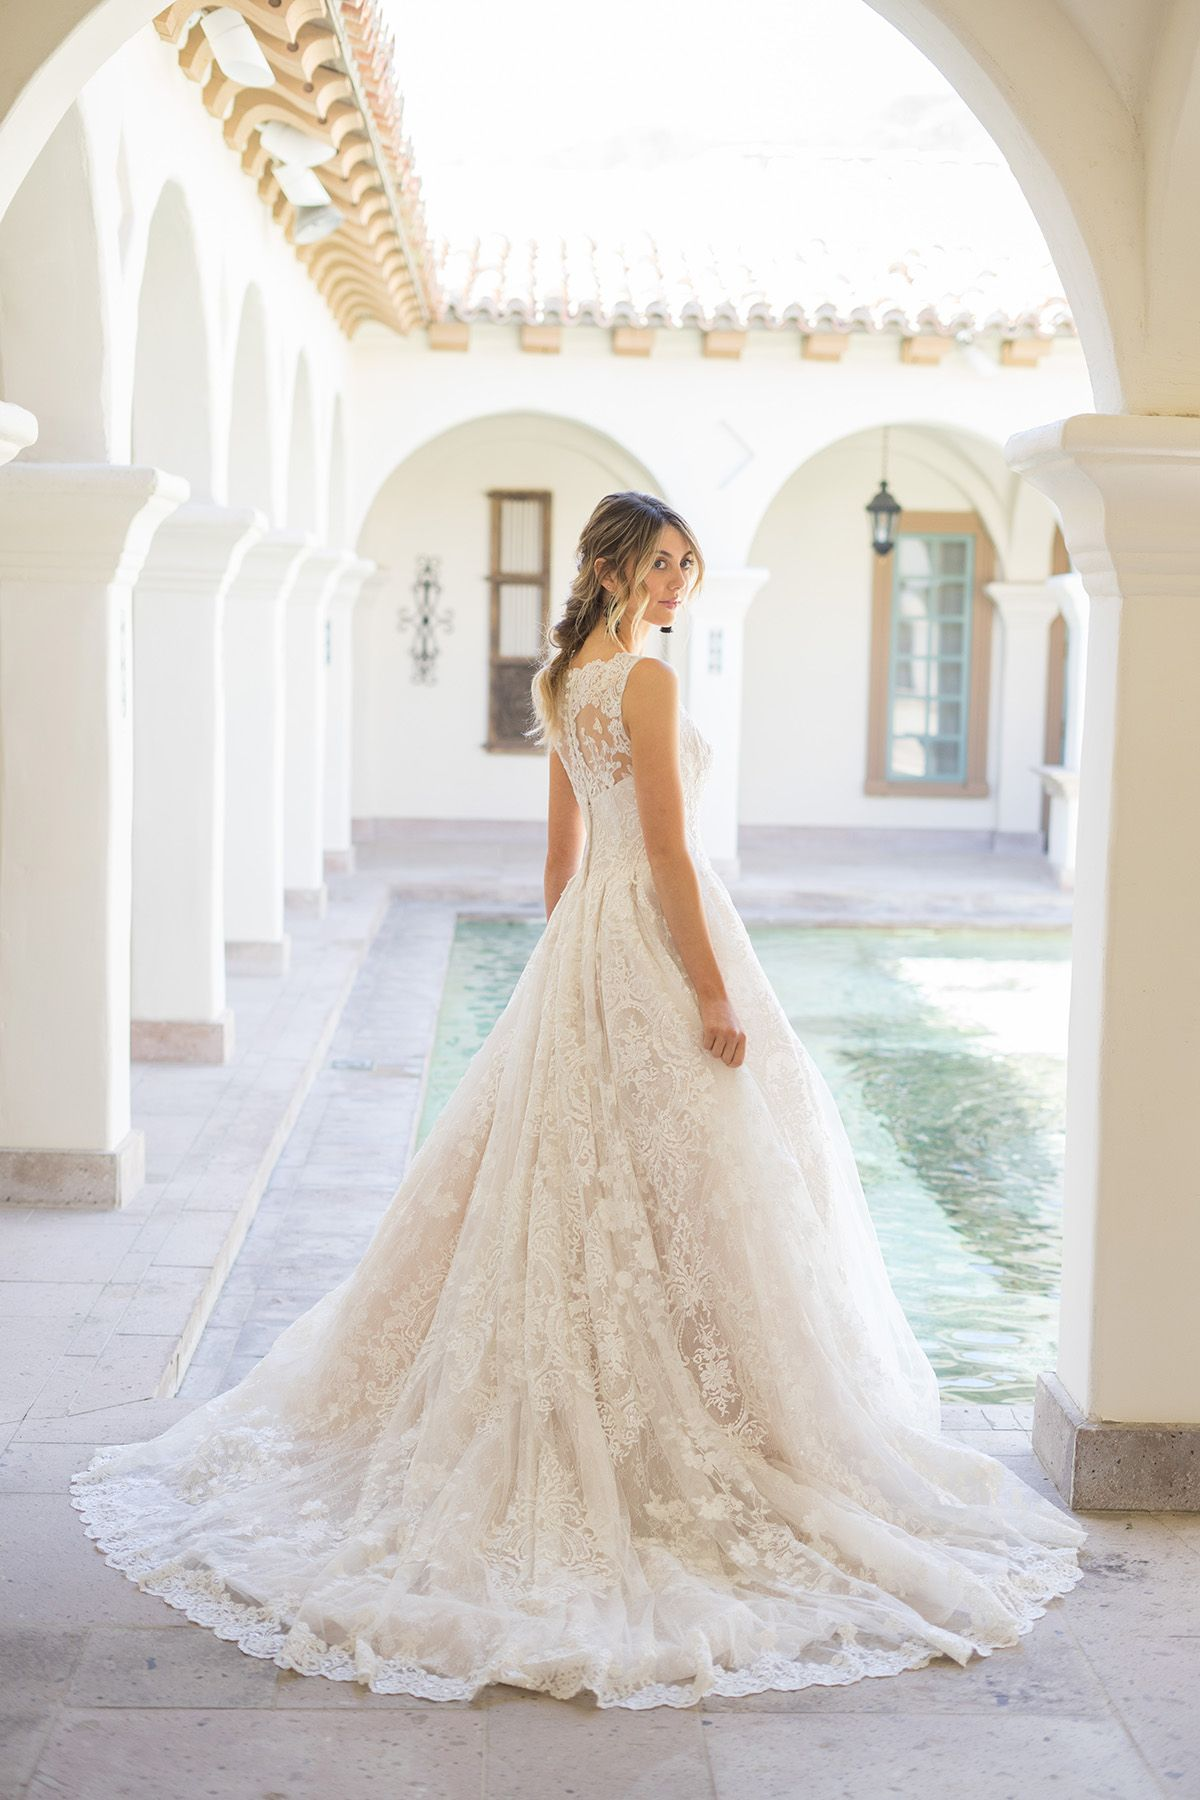 Oleg Cassini Beaded Lace Wedding Dress With Pleated Skirt